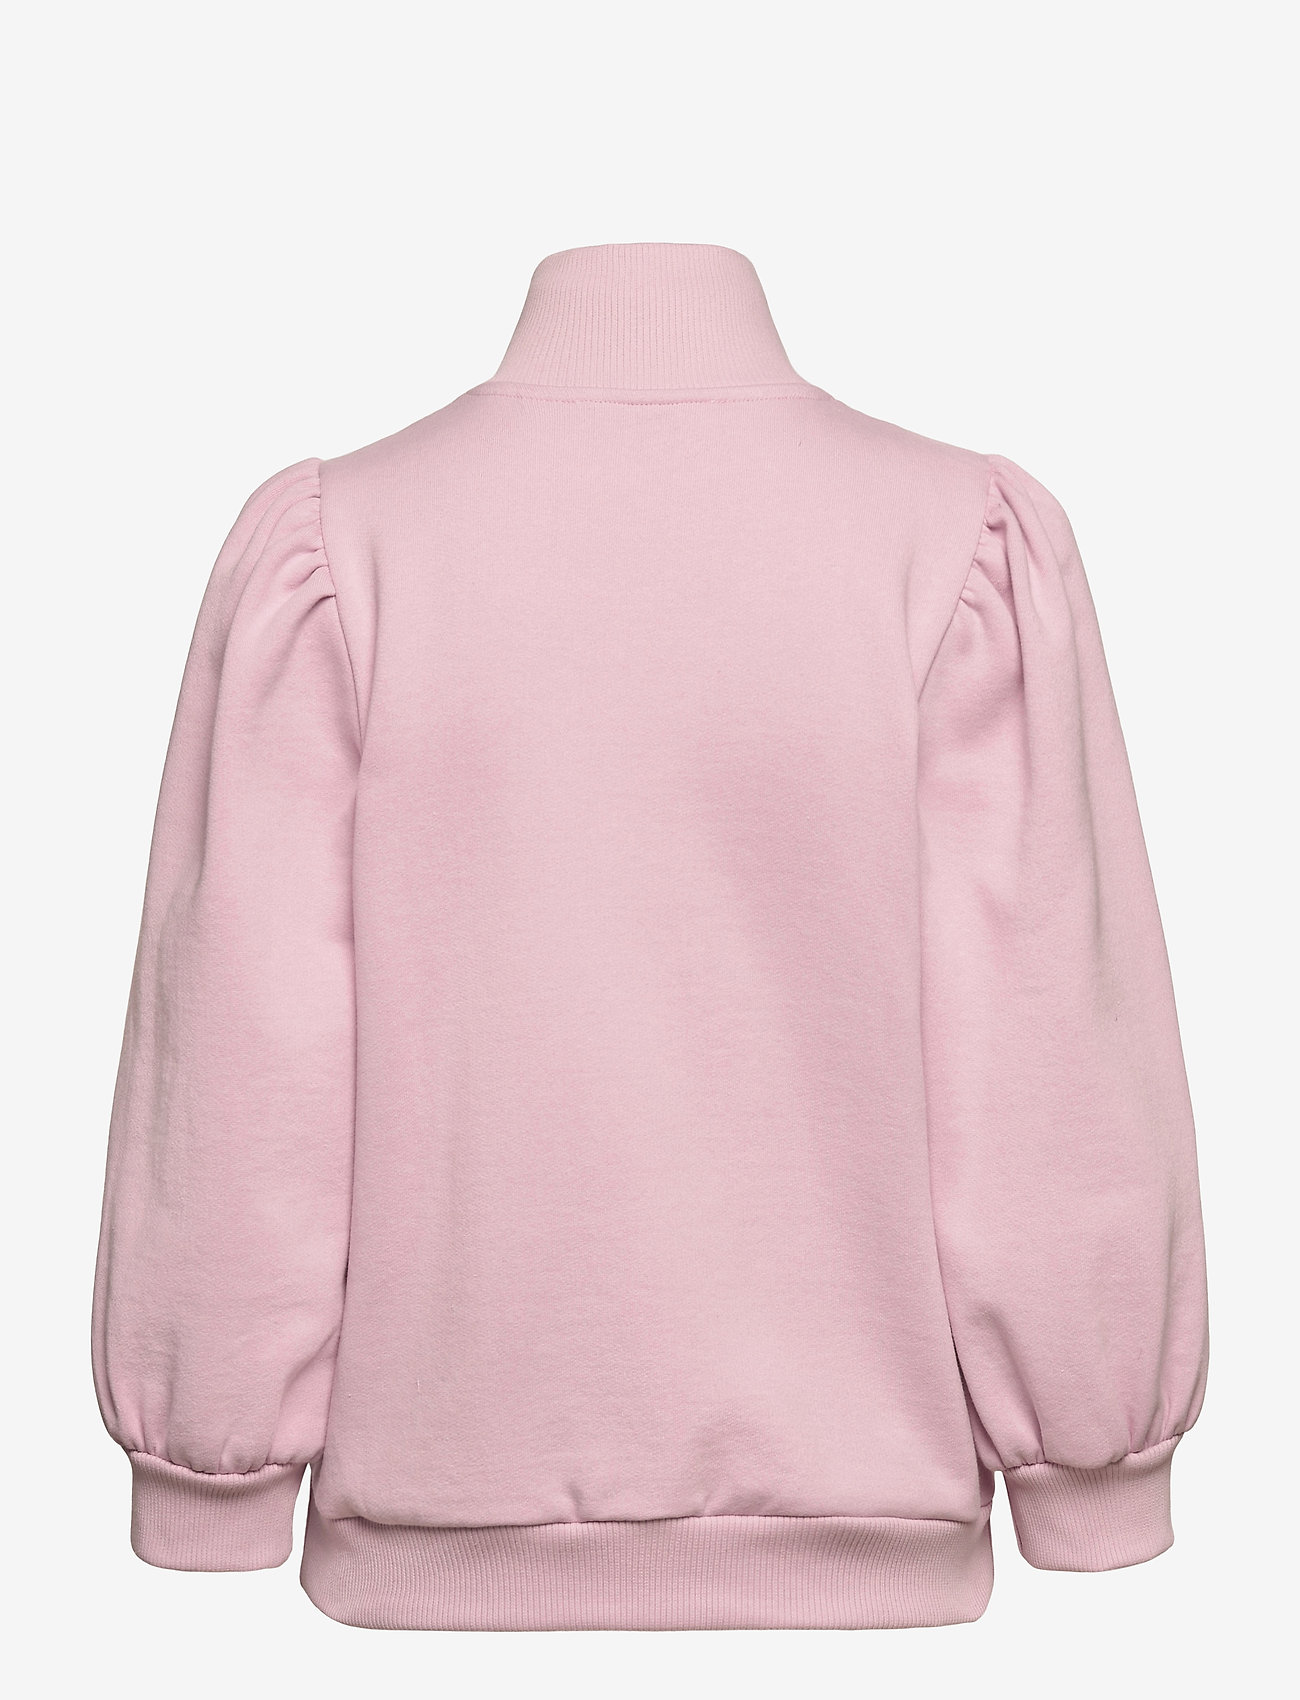 Gestuz - NankitaGZ ss zipper sweatshirt - sweatshirts & hoodies - fragrant lilac - 2